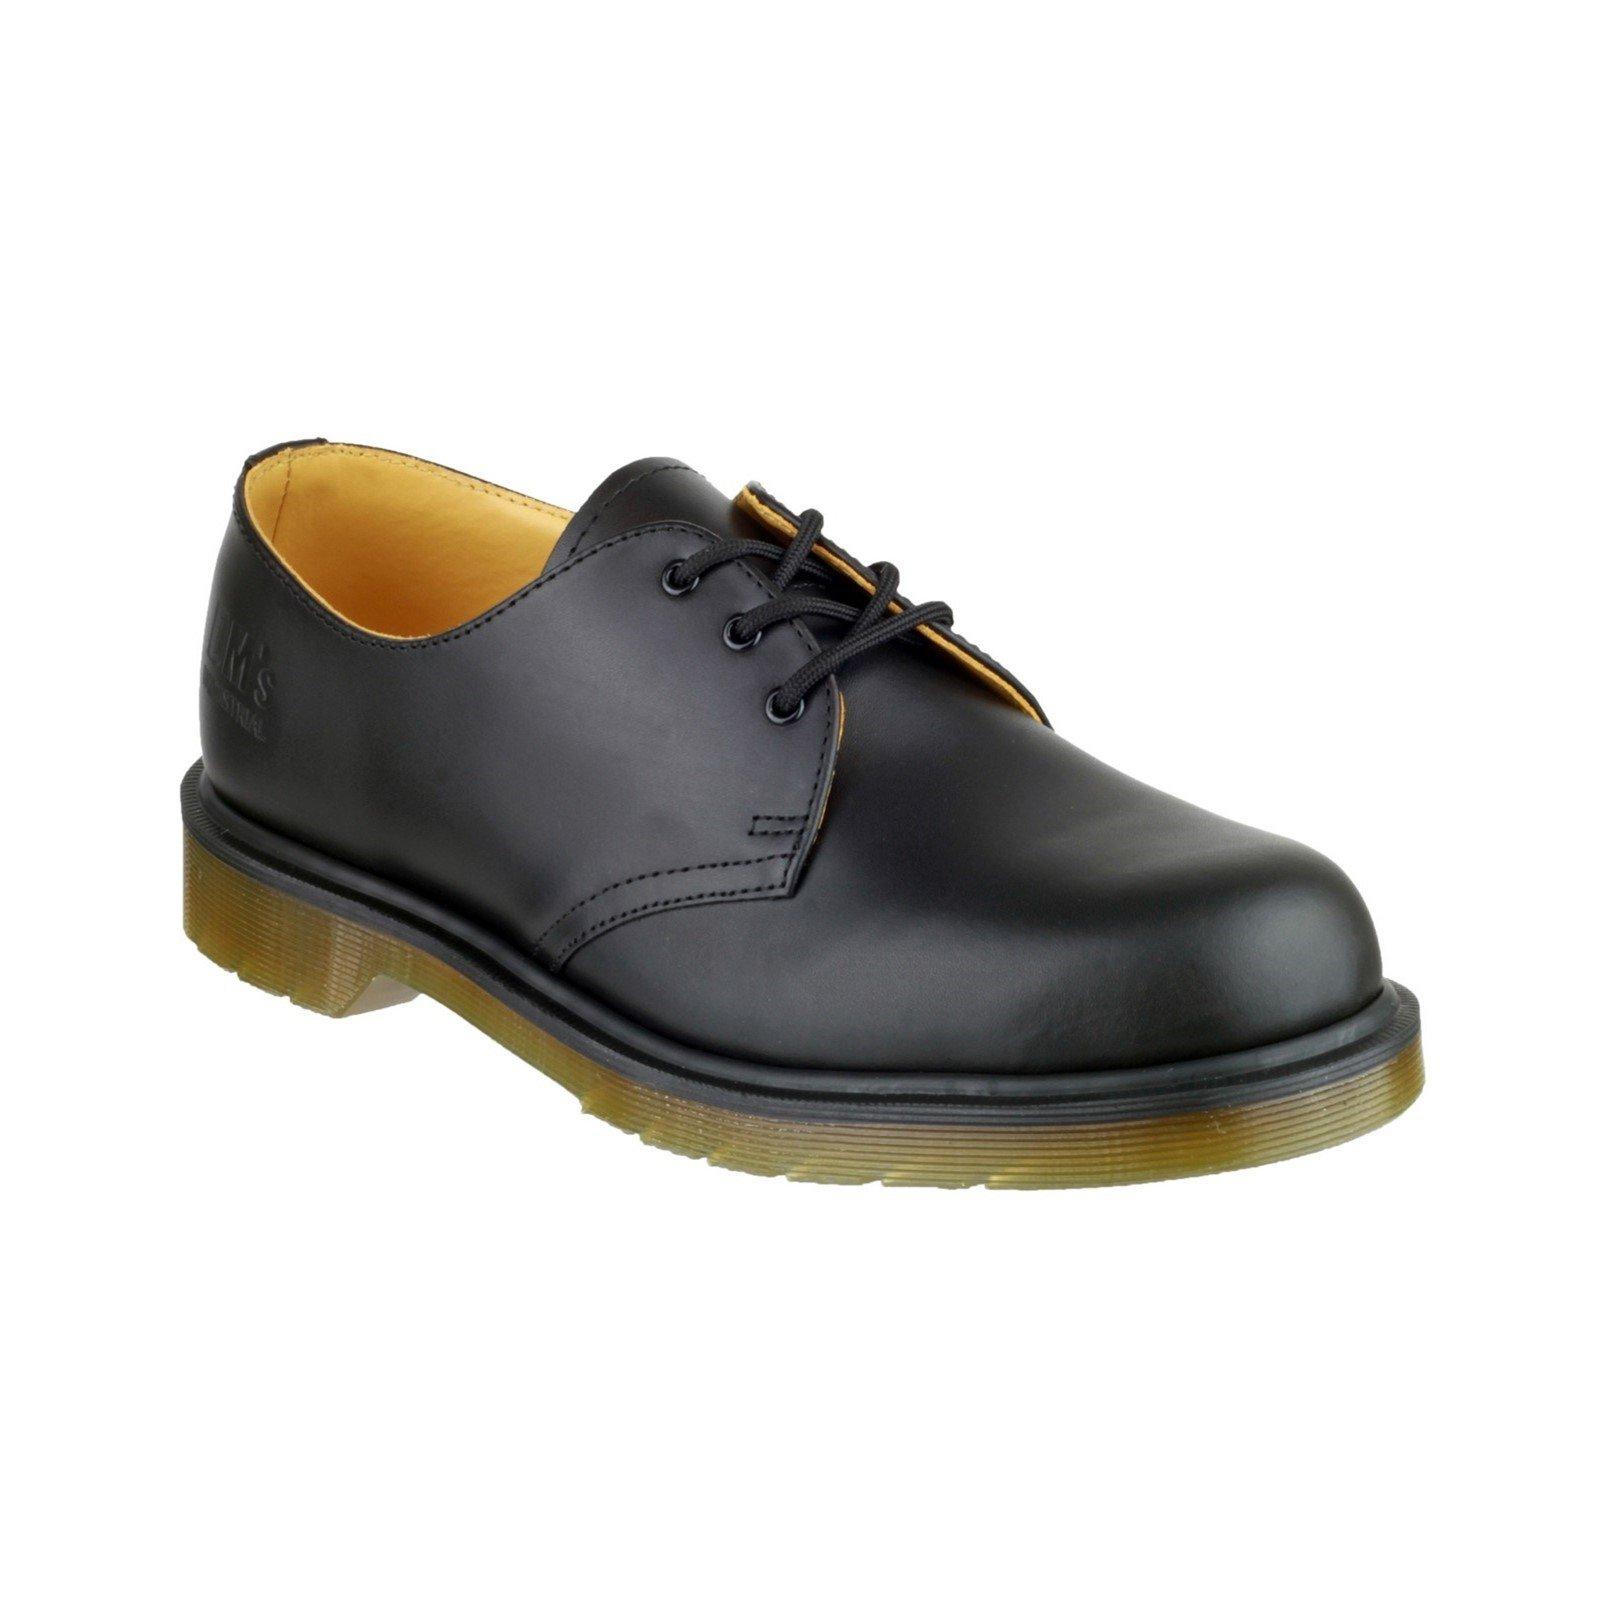 Dr Martens Men's Lace-Up Leather Derby Shoe Black 04915 - Black 10